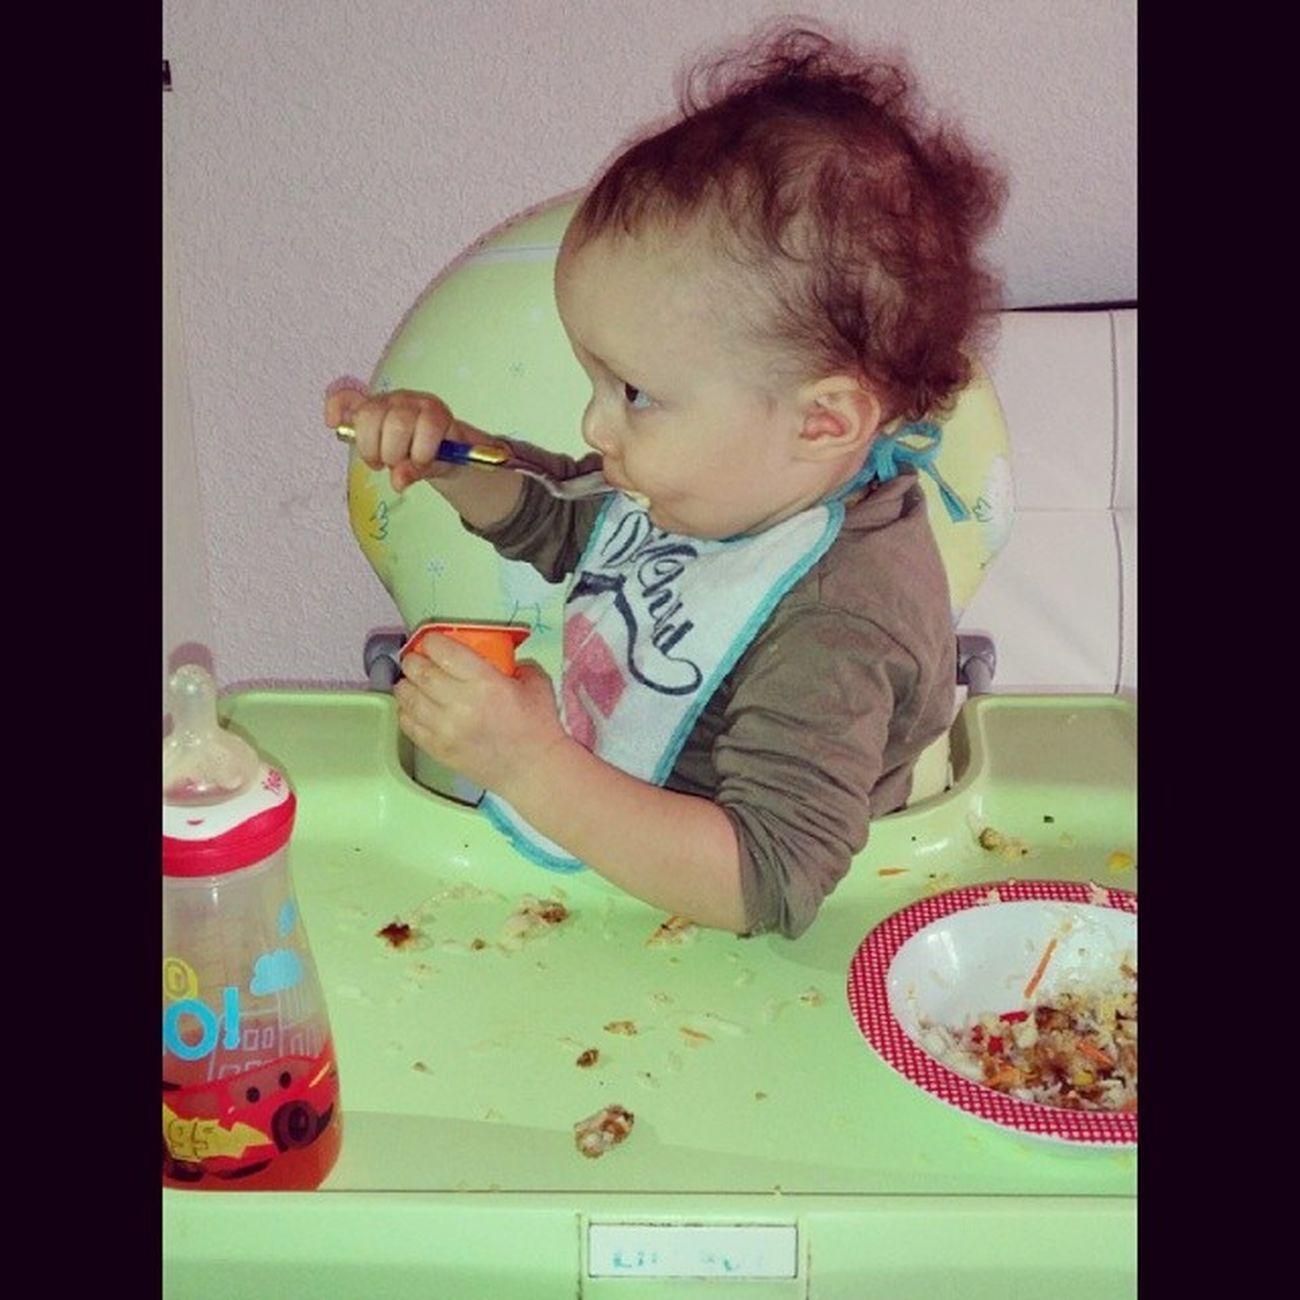 Mon fils a 15mois mange tout seul ?? Thiago Salvatore 15mois ? Italiano ❤